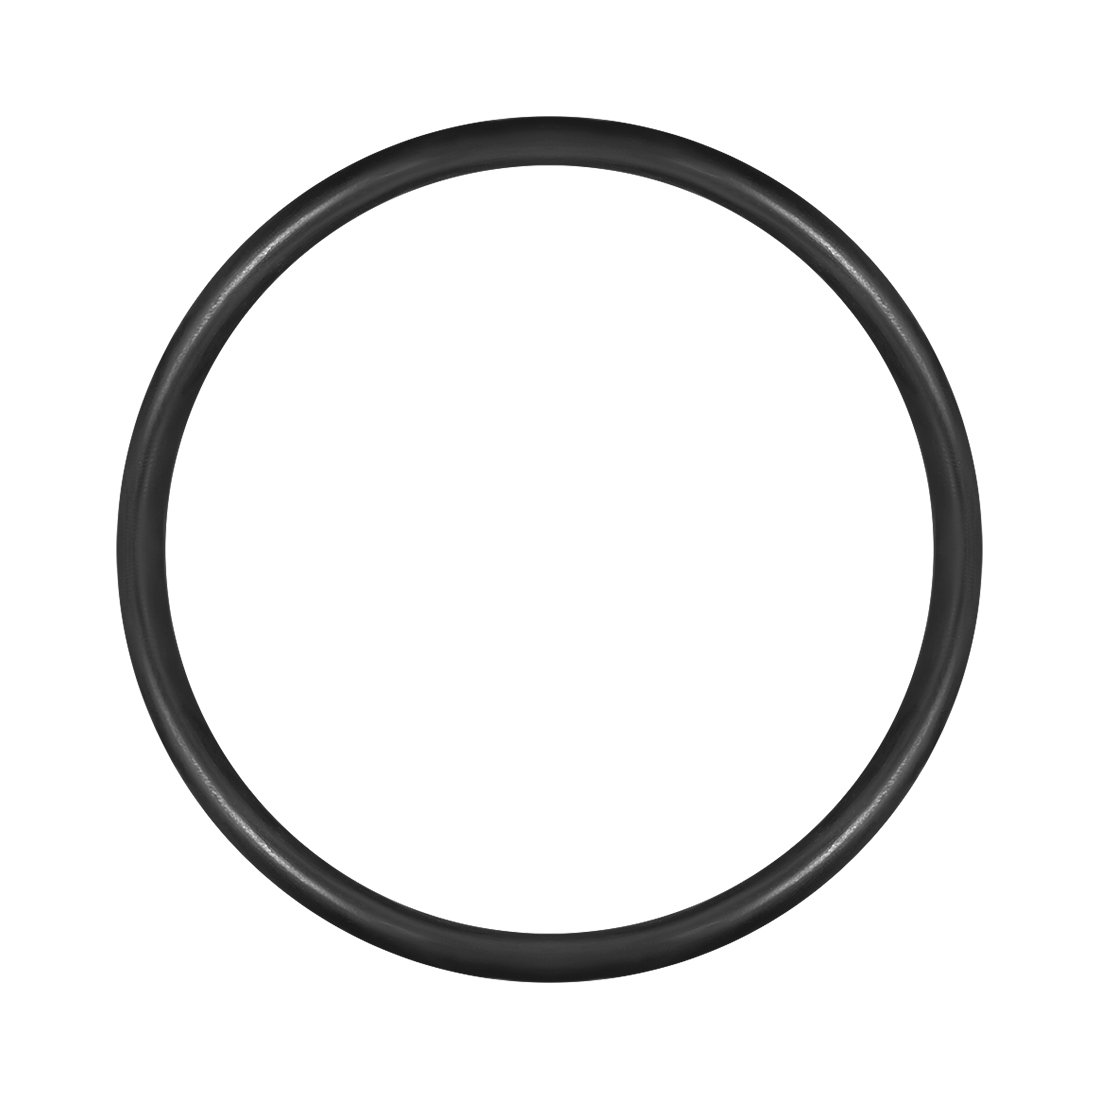 1mm Width sourcingmap O-Rings Nitrile Rubber 23mm OD 21mm Inner Diameter Pack of 50 Round Seal Gasket